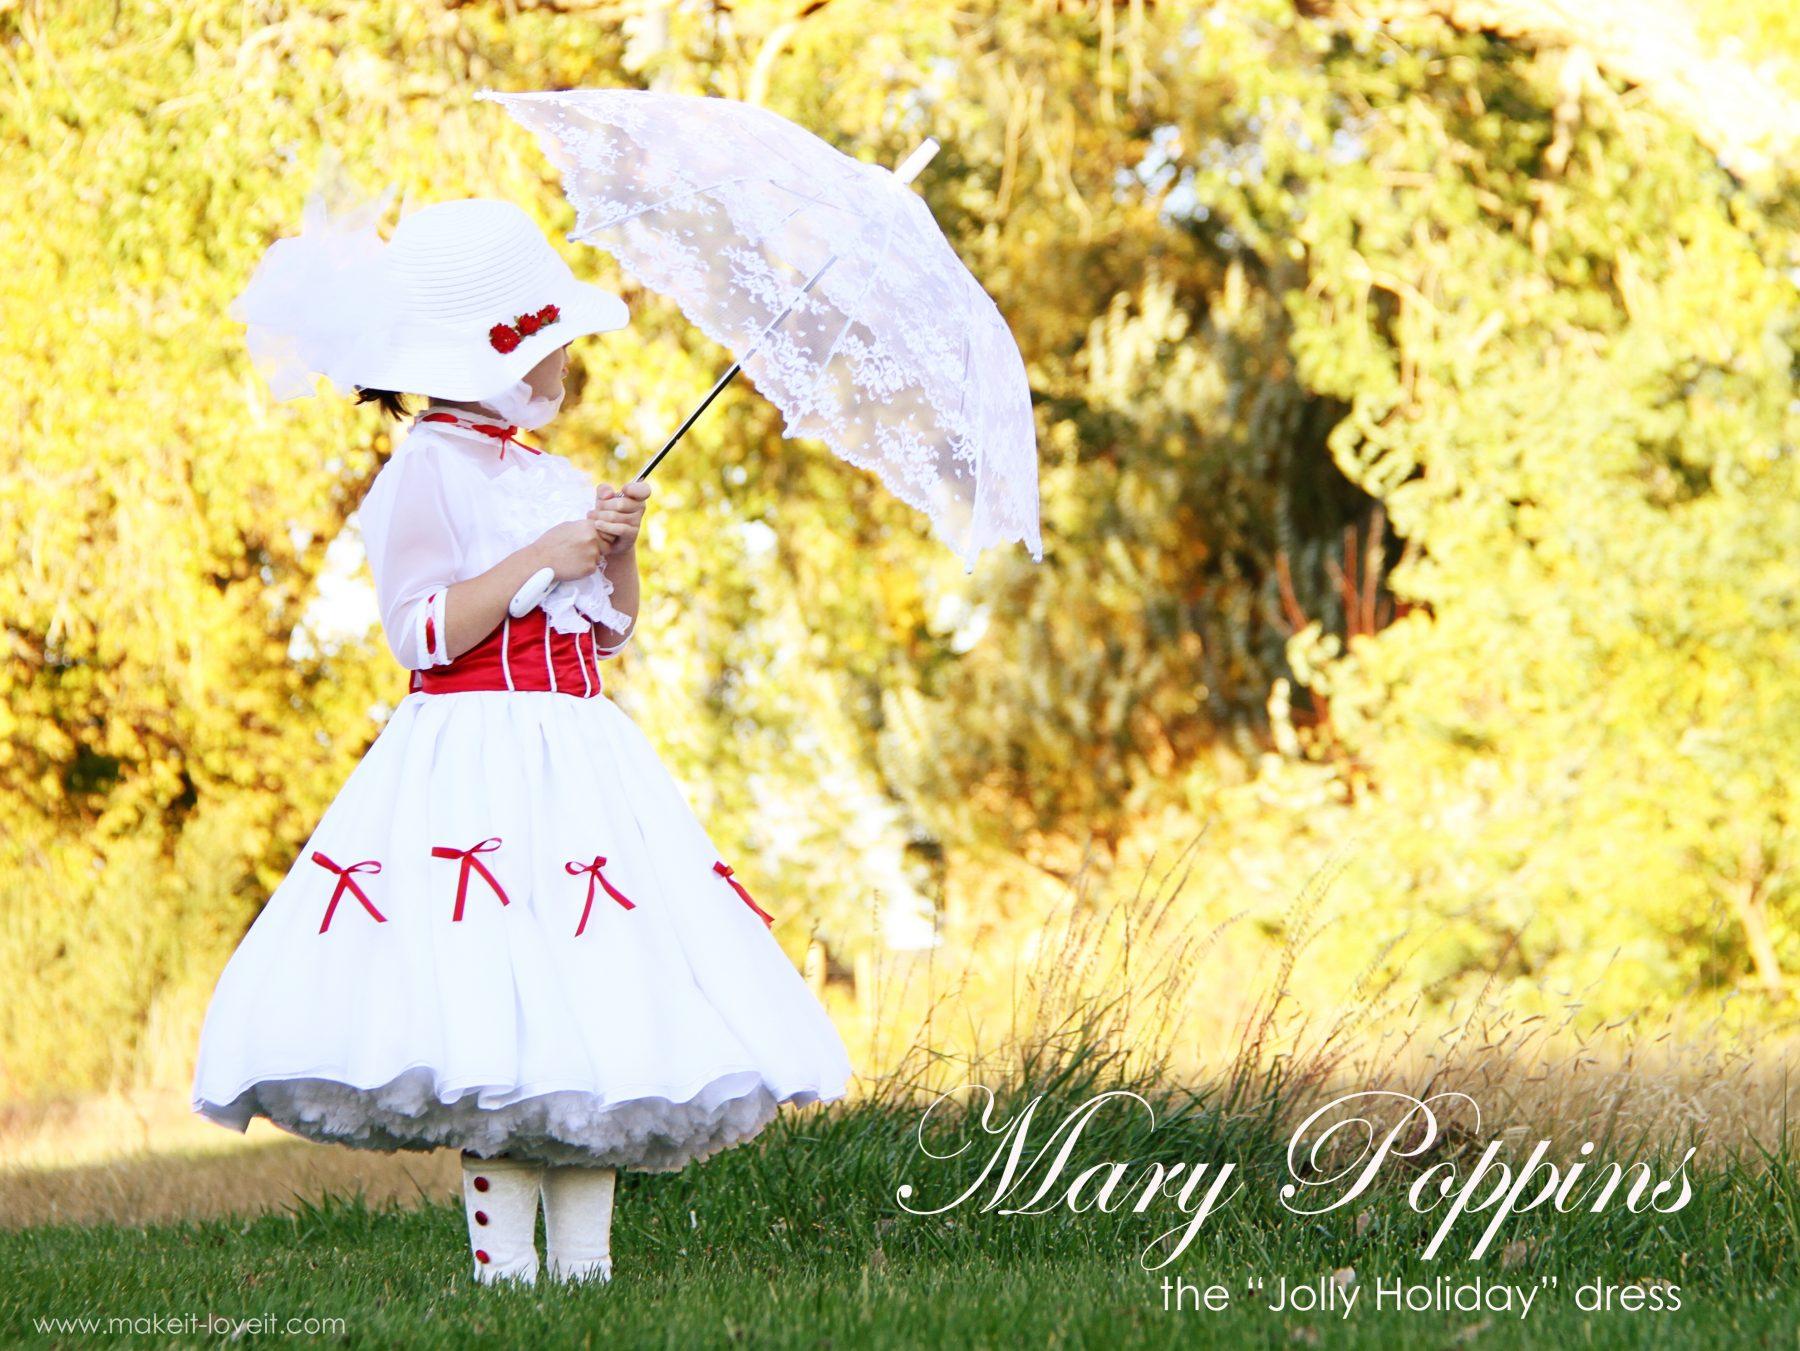 Mary Poppins Costume - DIY Halloween Costume